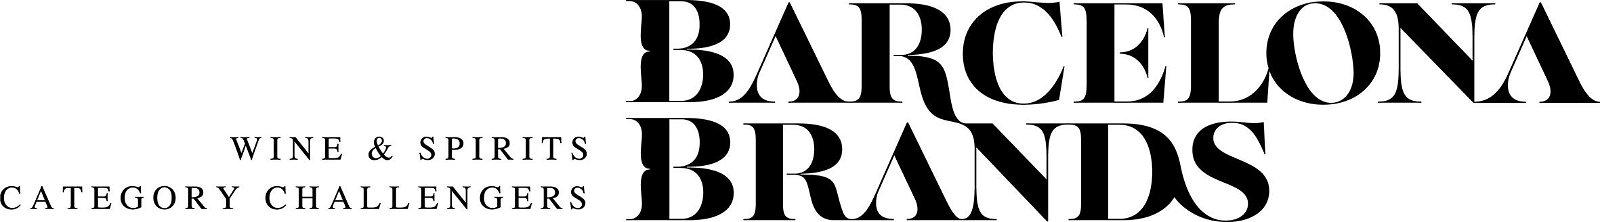 Barcelona Brands